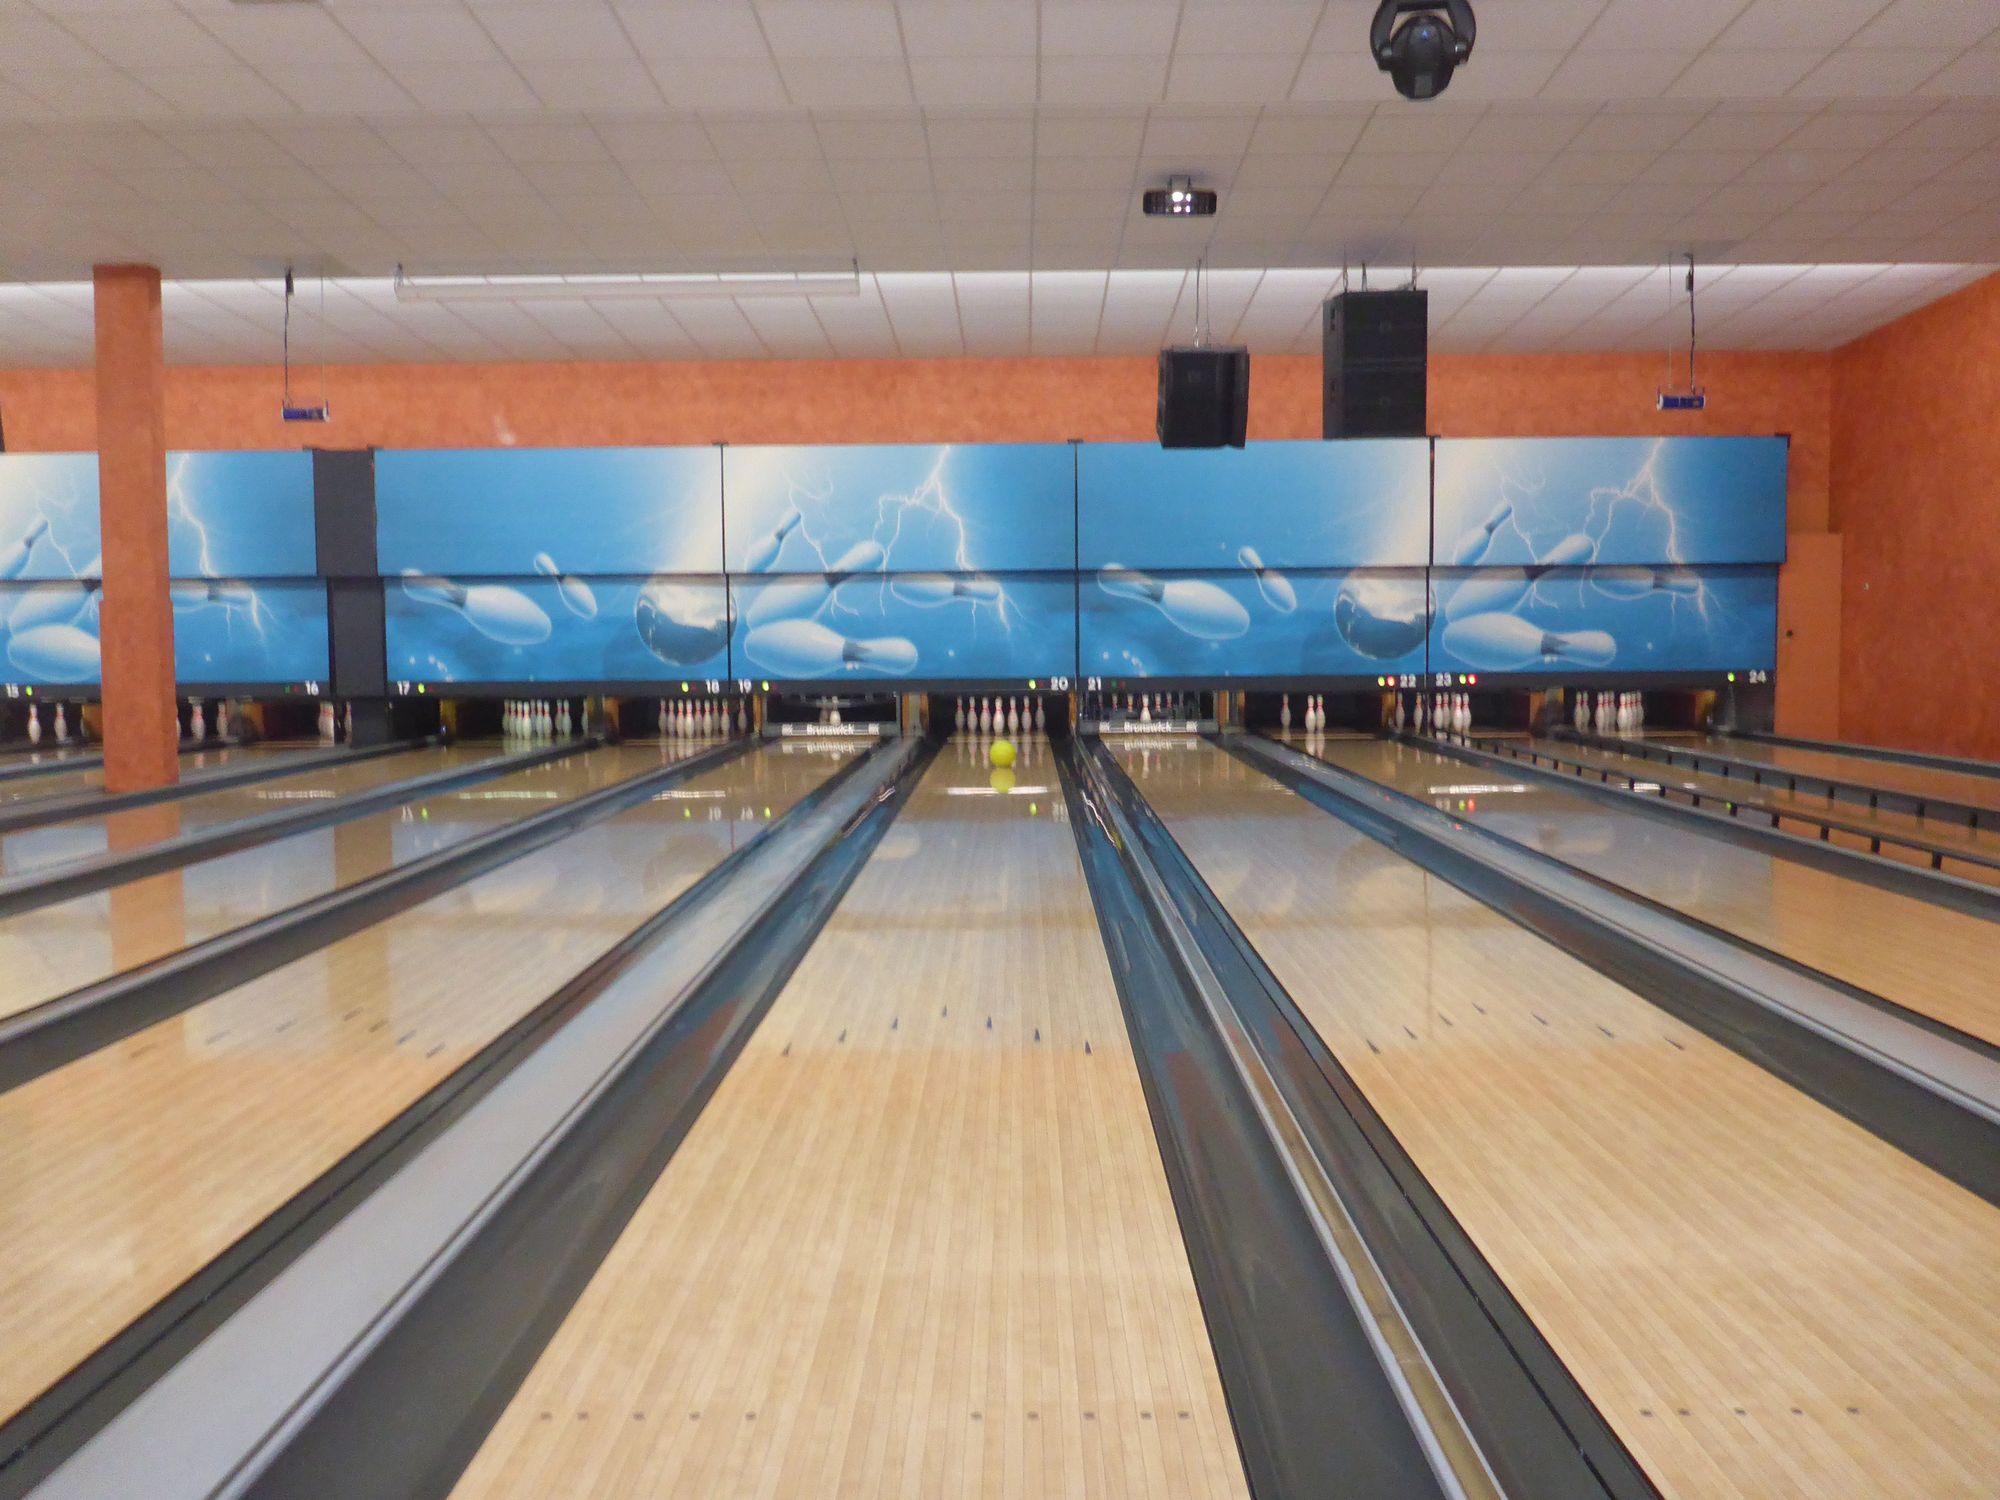 Allgemein Jugend Ausflug Bowling 01